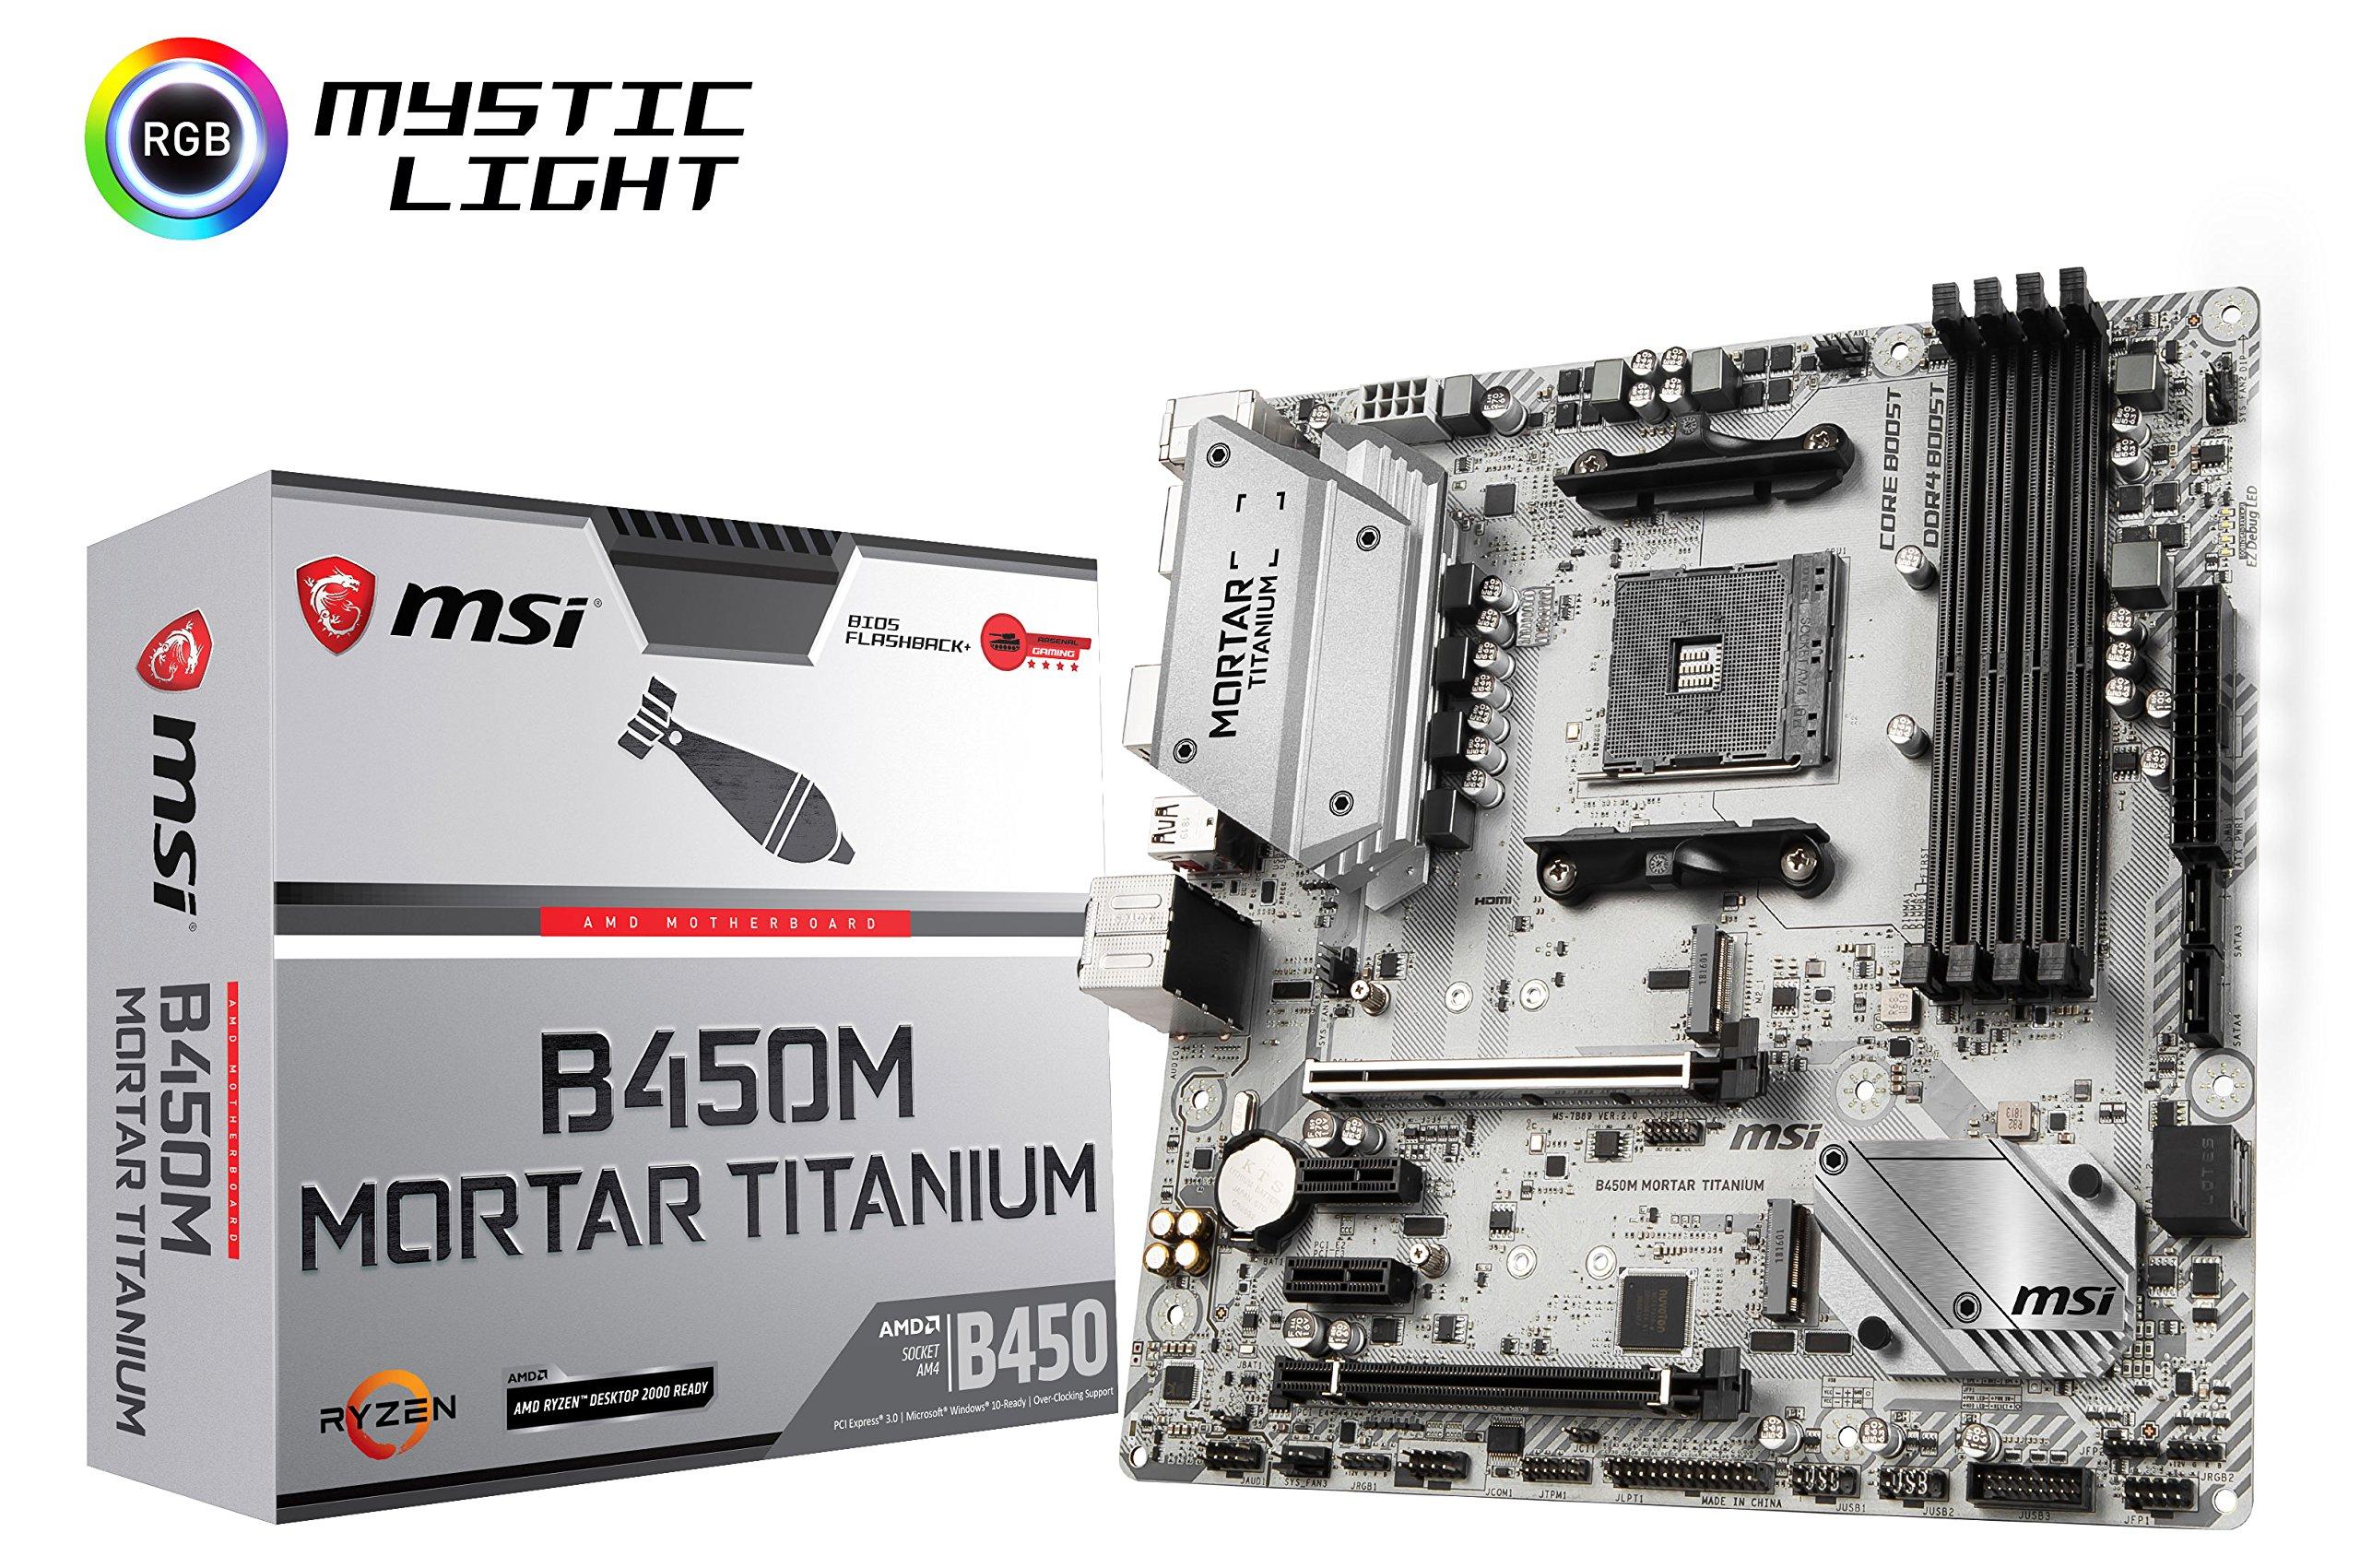 MSI B450M Mortar Titanium Computer Motherboards by MSI